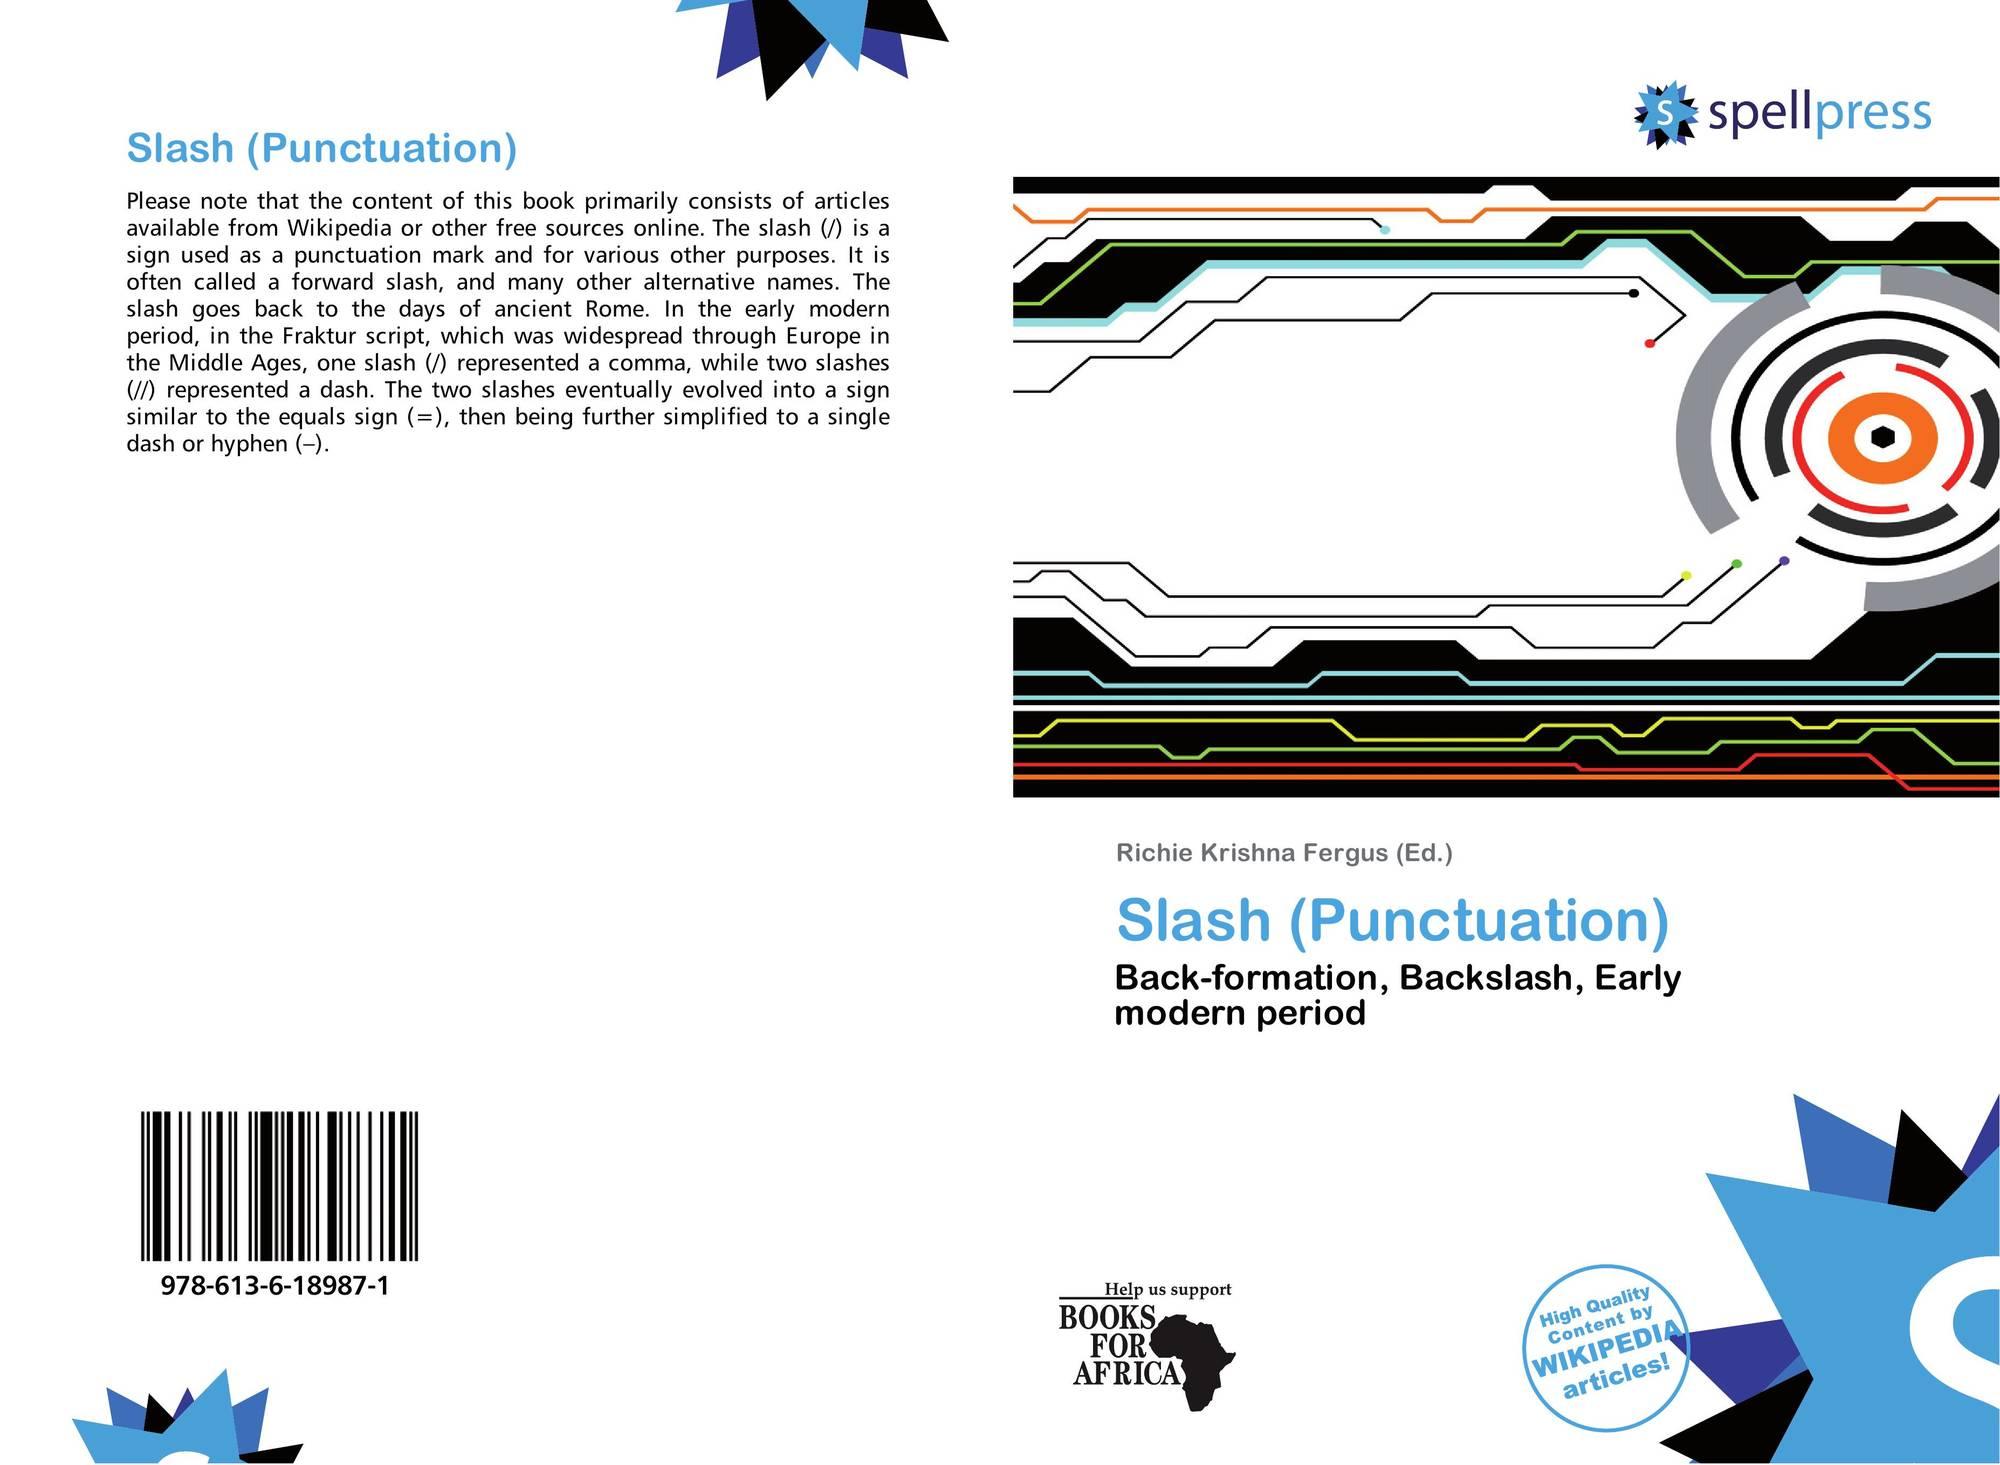 Slash (Punctuation), 978-613-6-18987-1, 6136189879 ,9786136189871